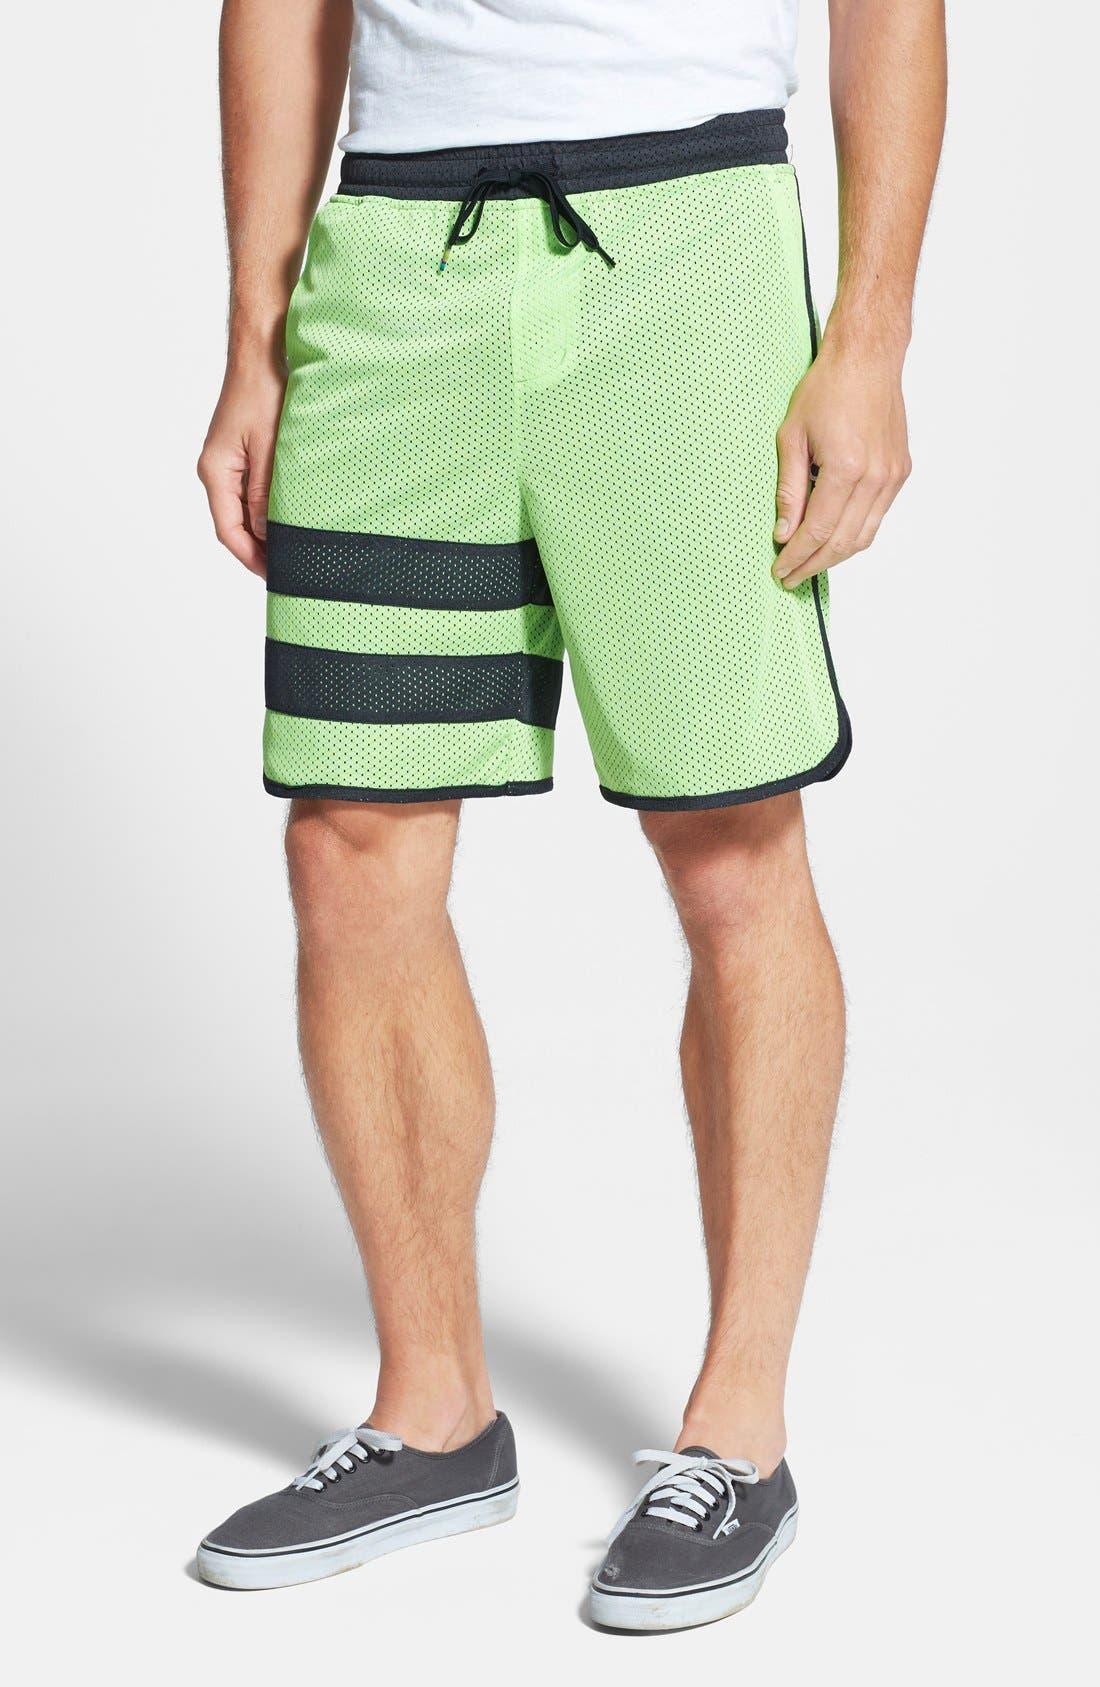 Alternate Image 1 Selected - Hurley 'Block Party' Mesh DRI-Fit Shorts